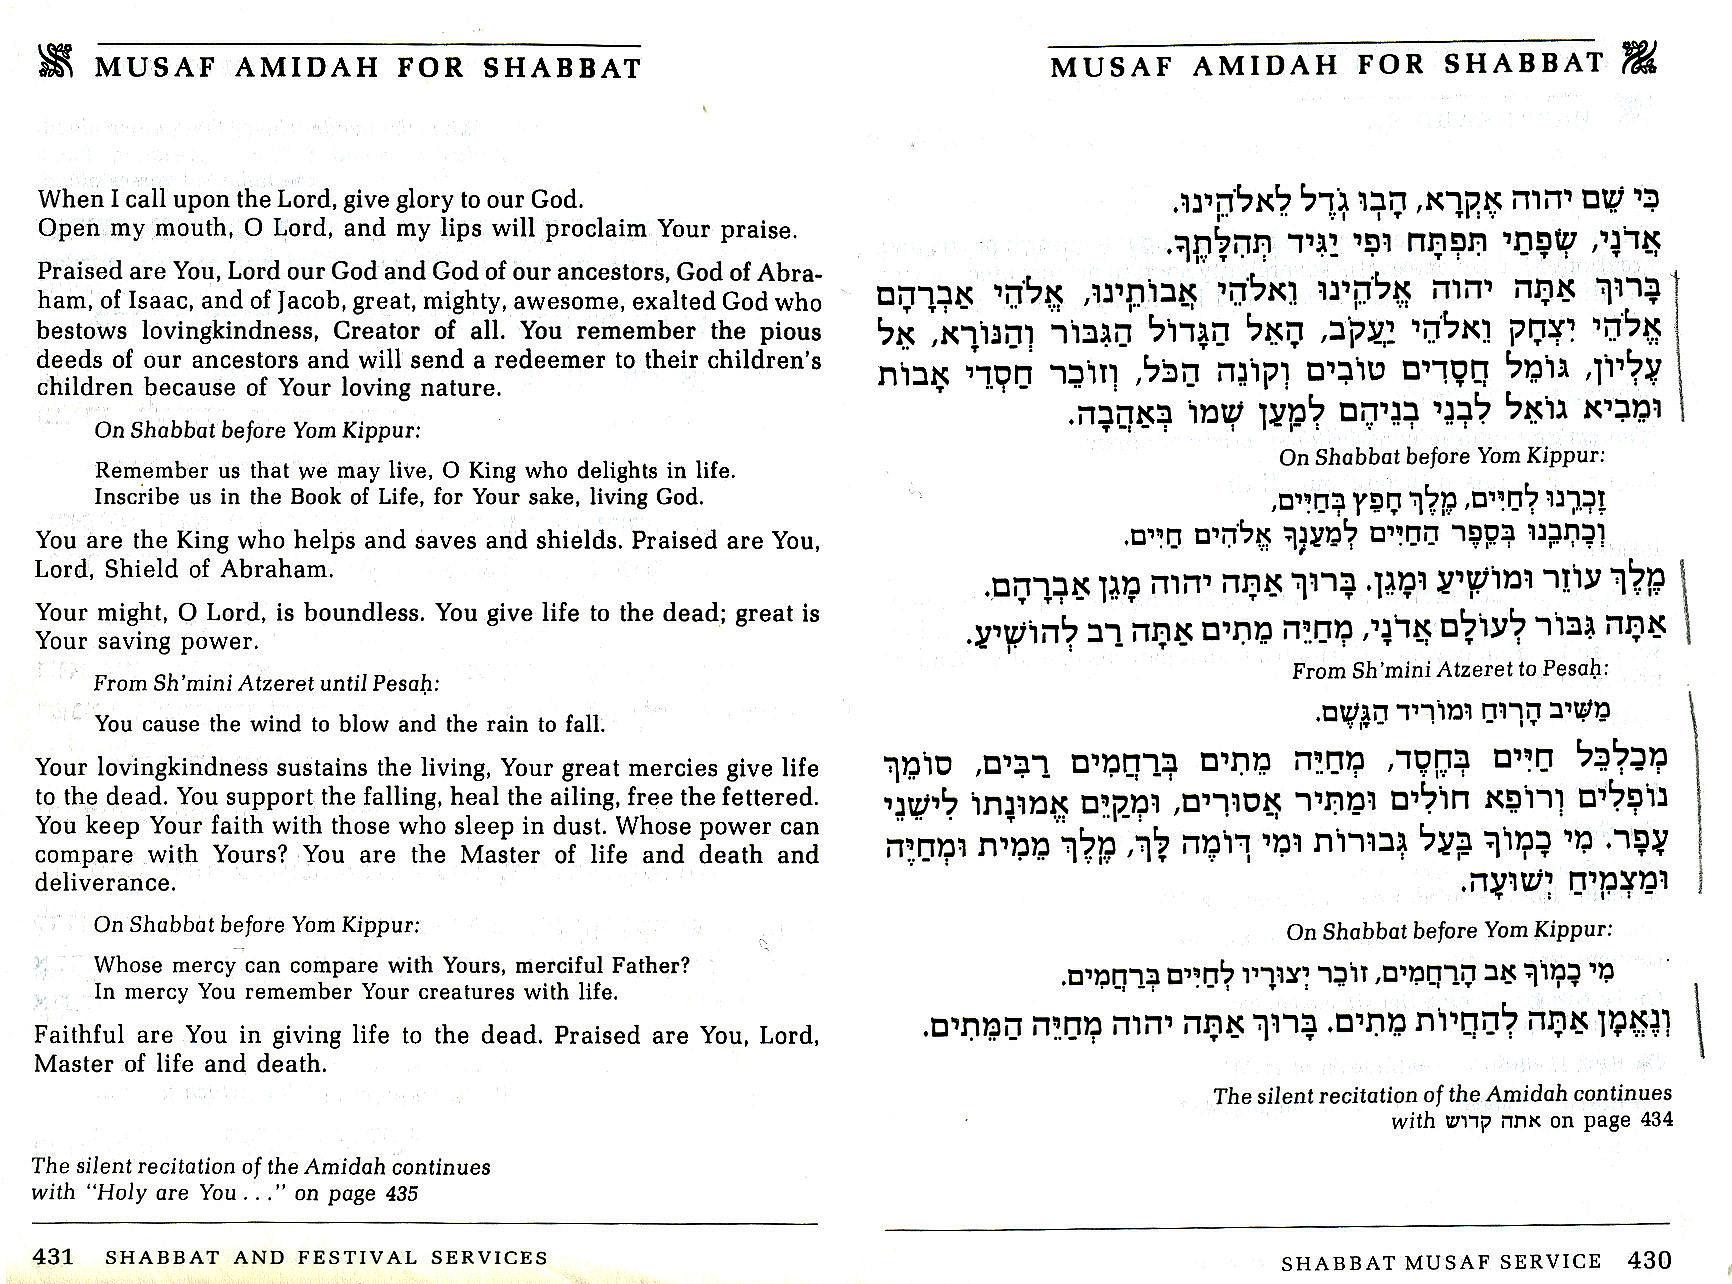 Shabbat Service Audio